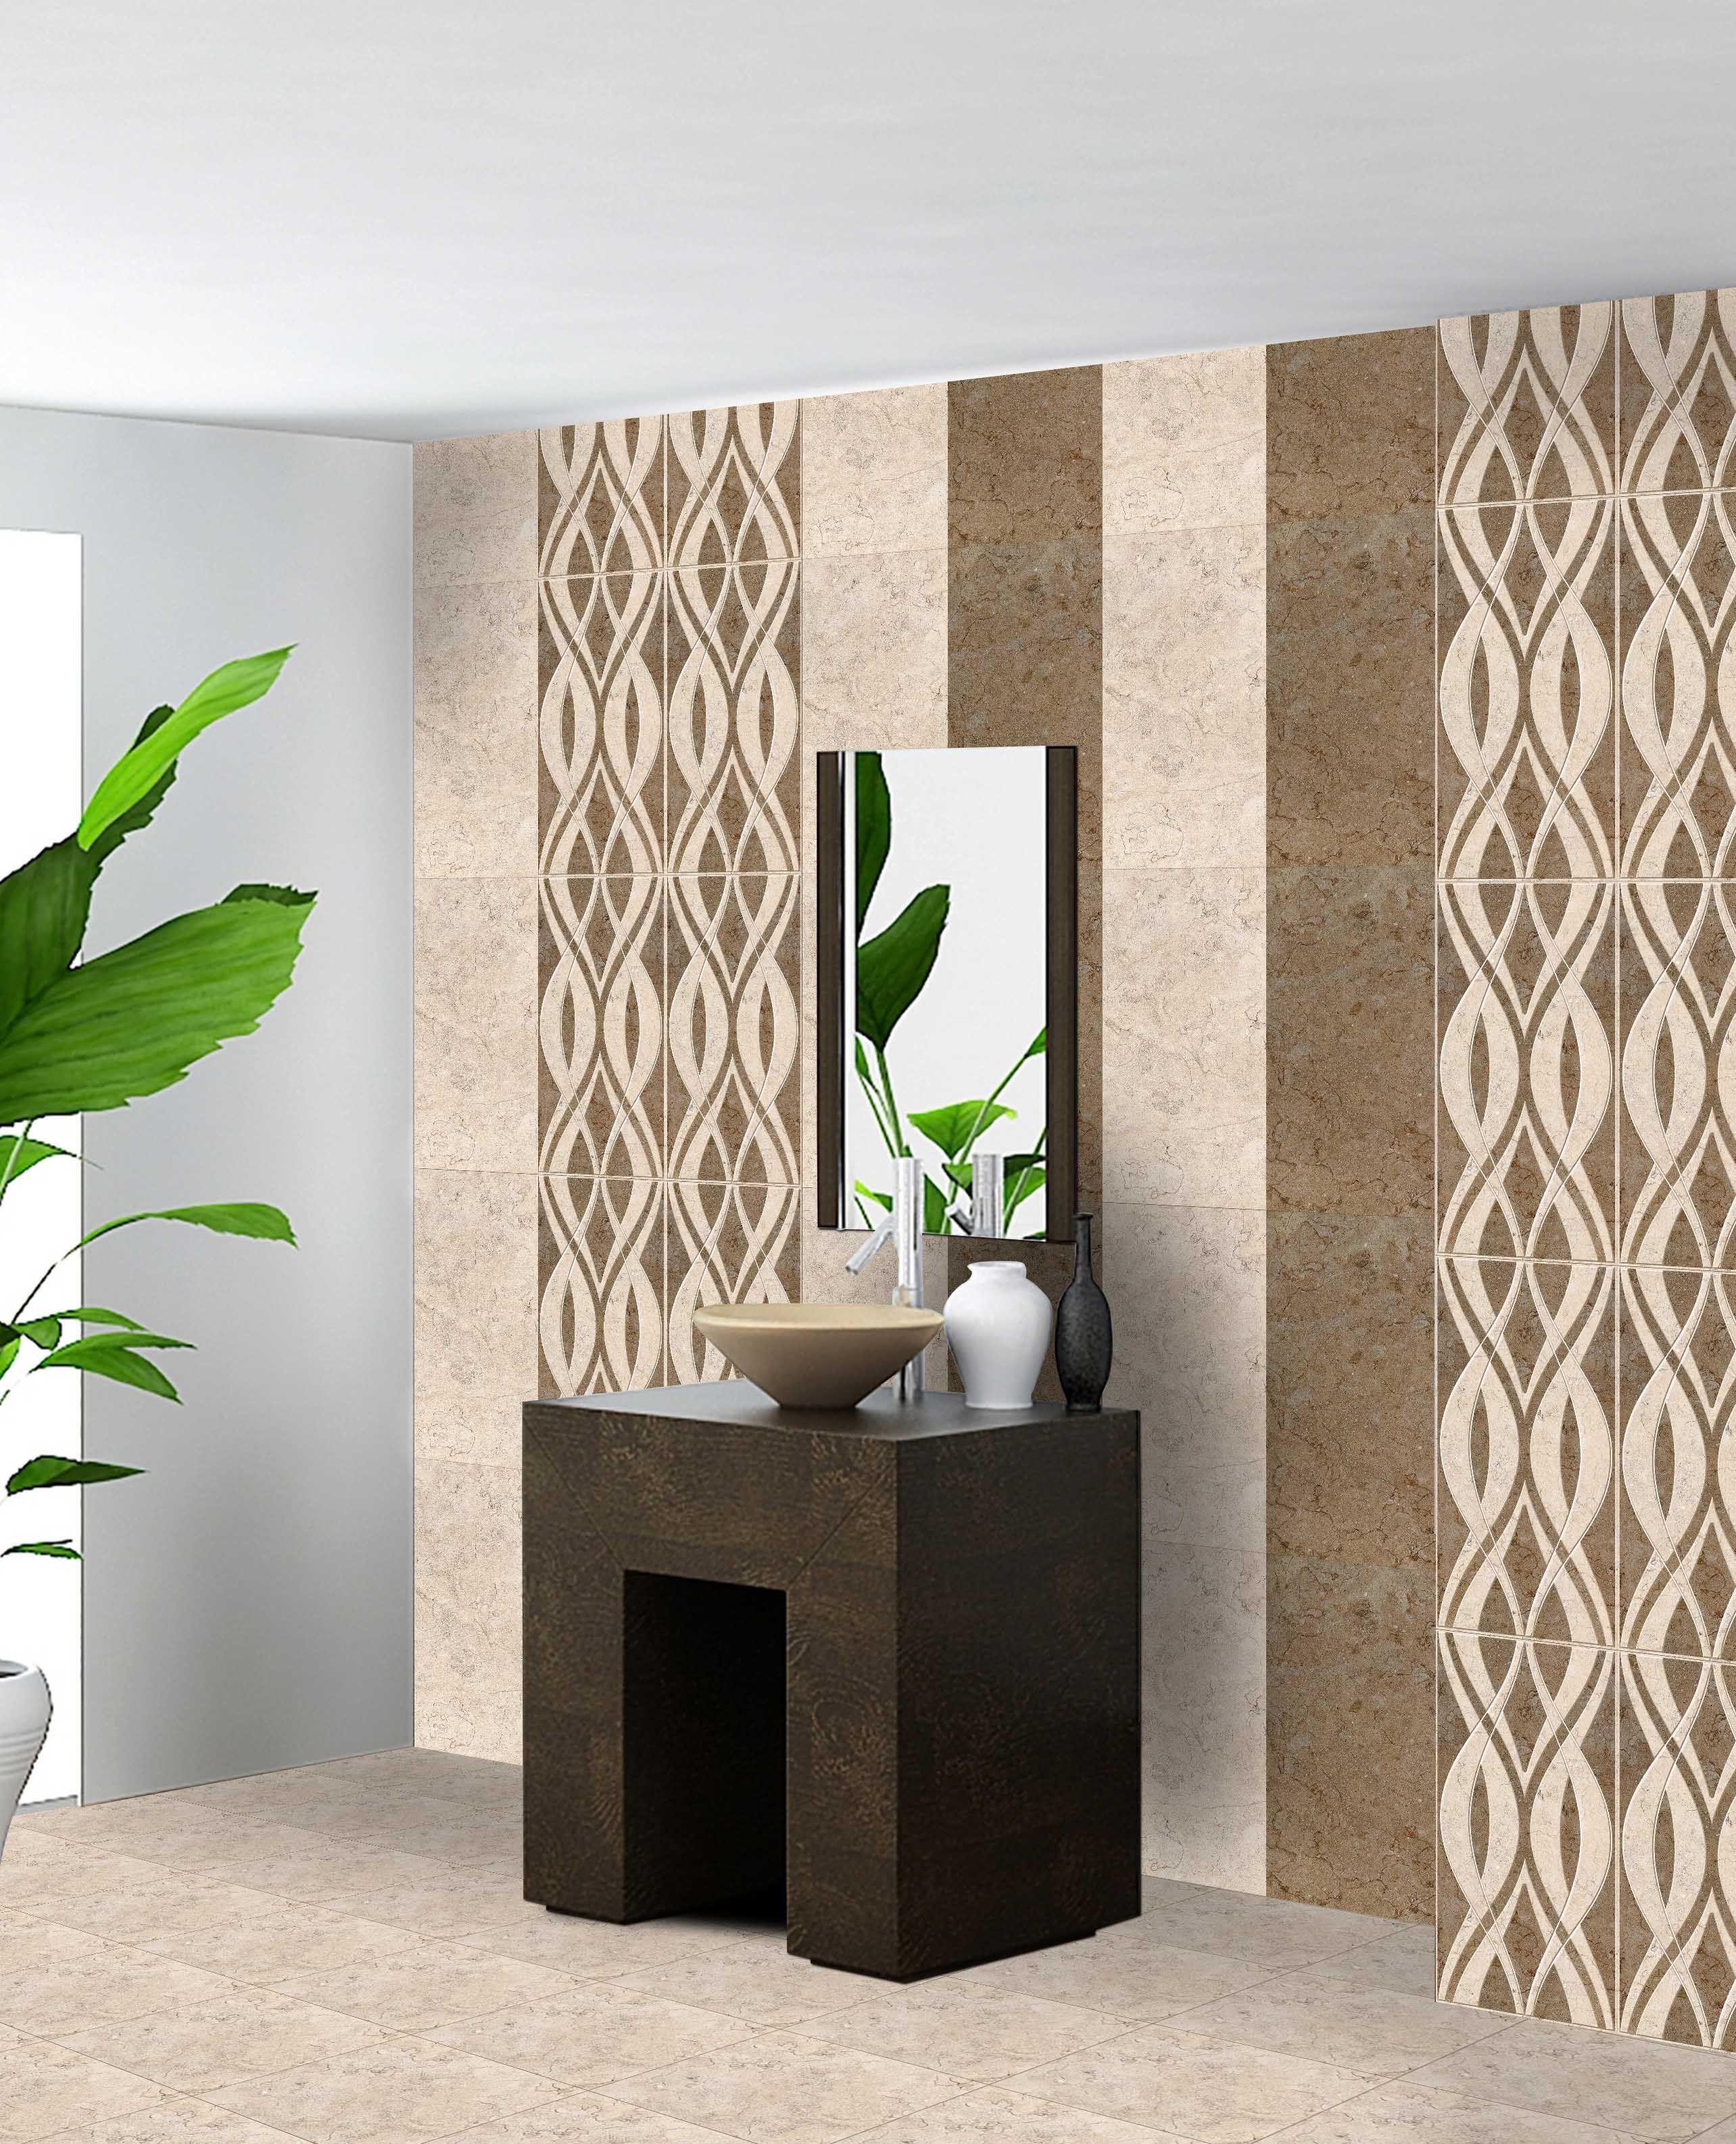 New Designs For Orient Digital Tiles   Http://www.orientbell.com